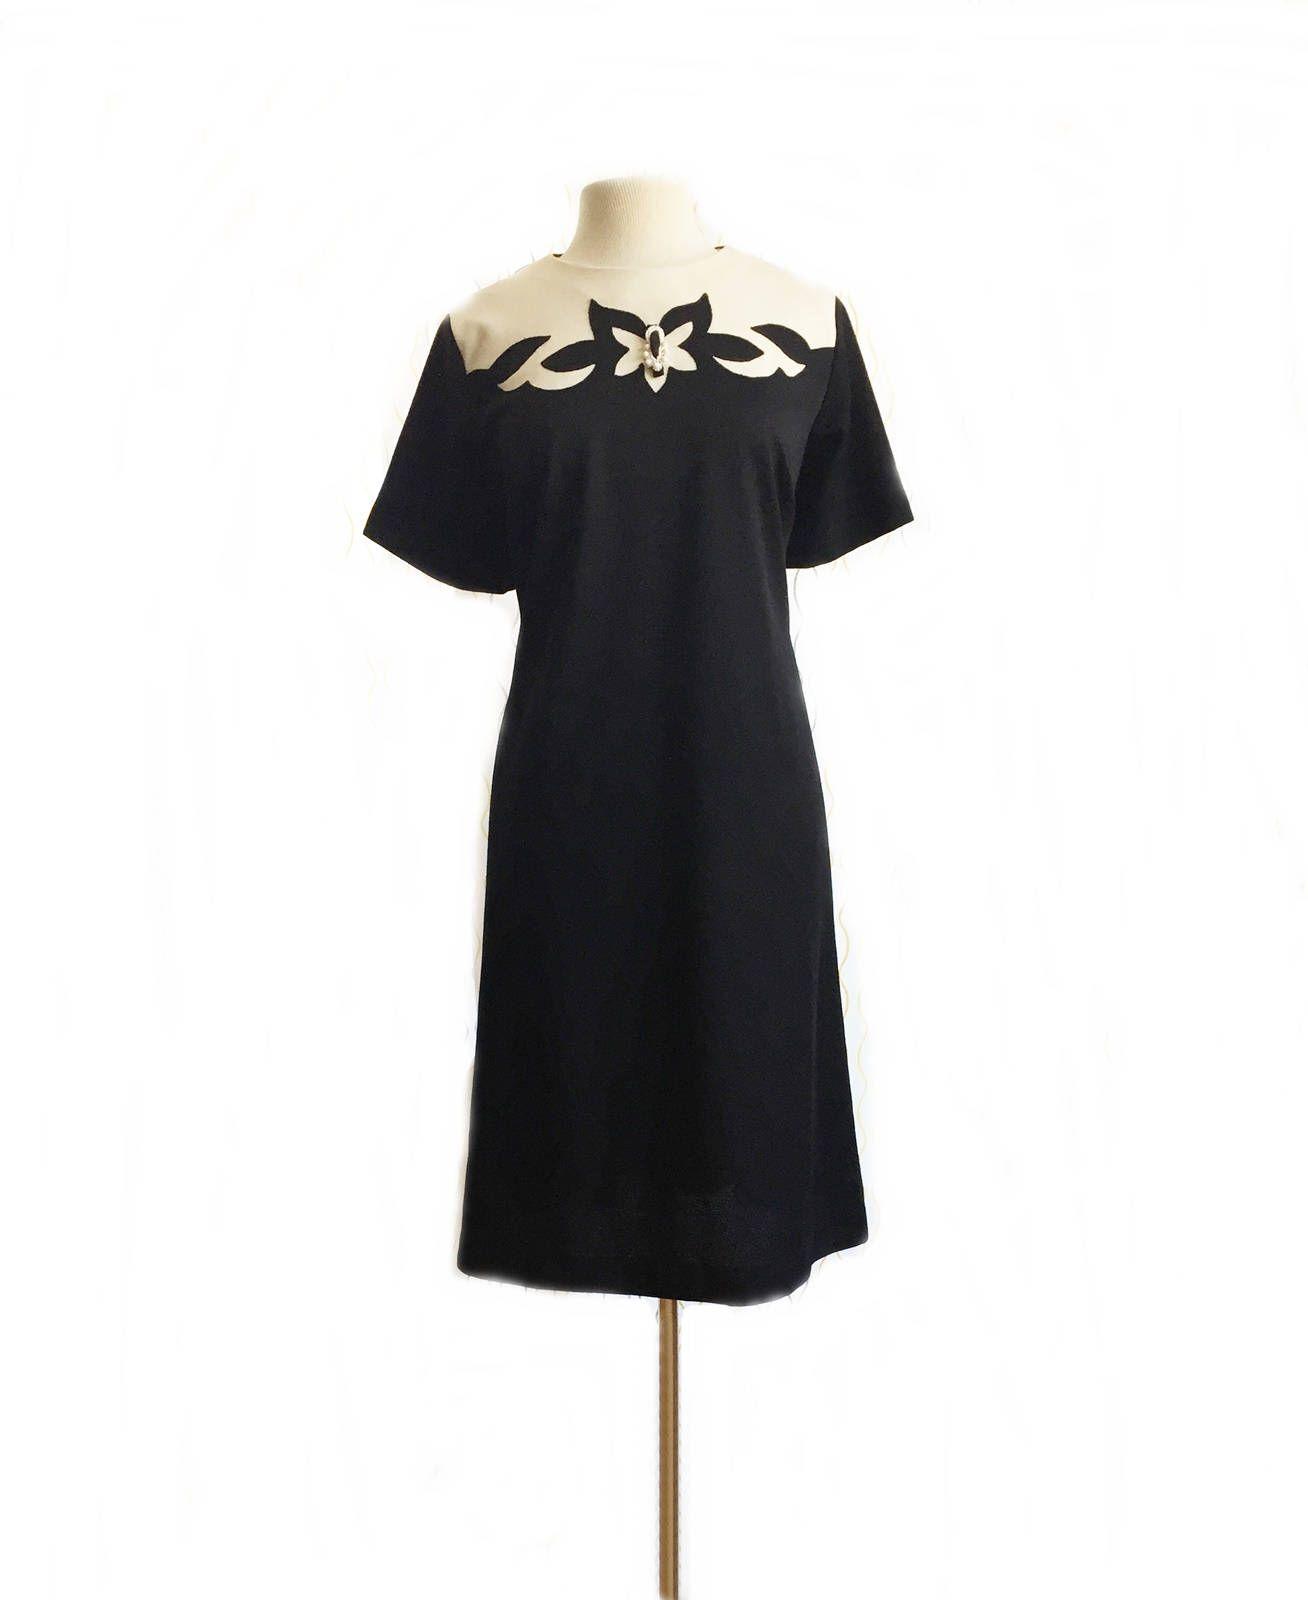 Vintage 60s shift dress/ black & white preppy dress/ abstract cutout ...